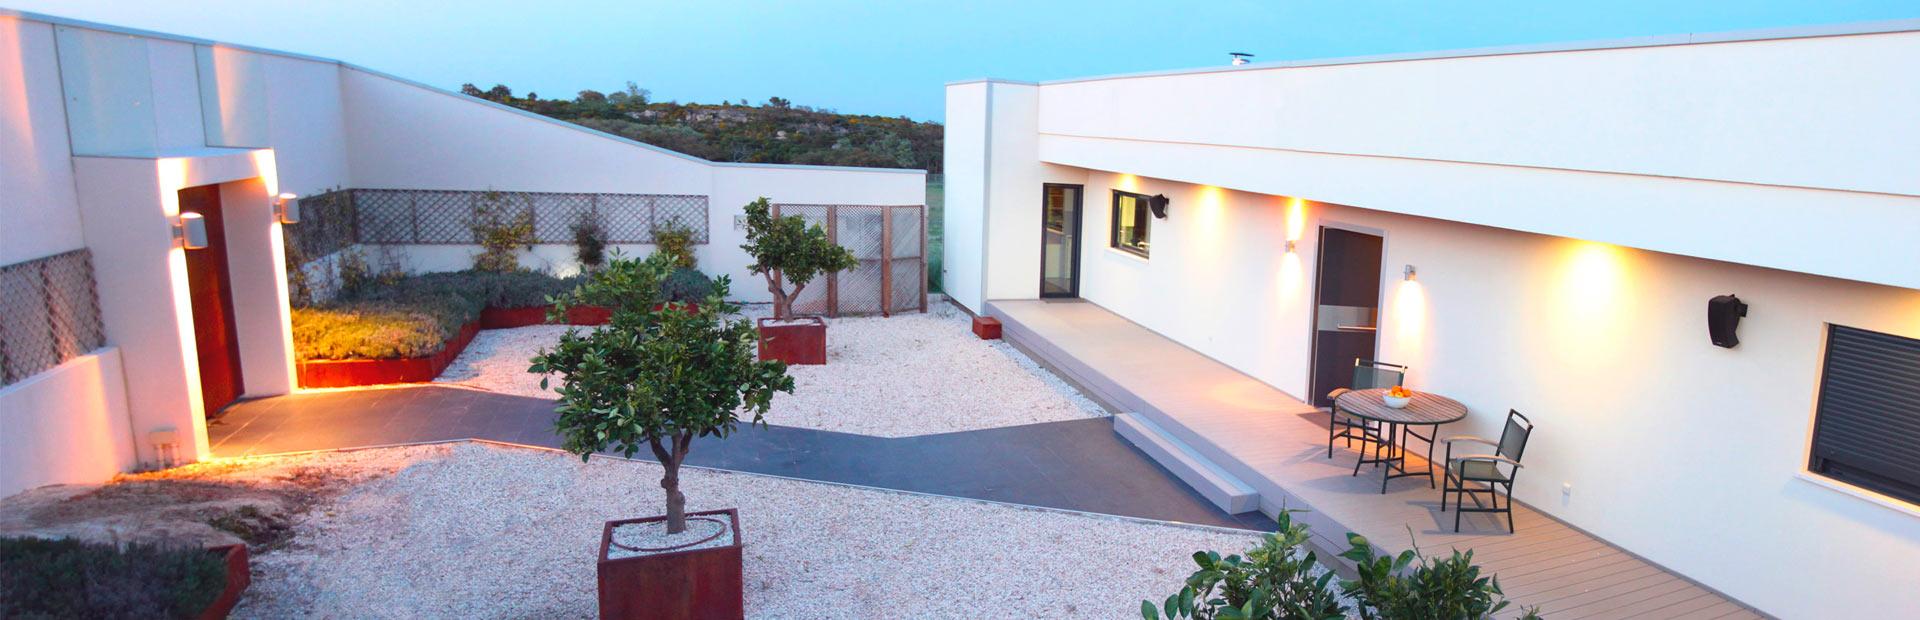 casa prefabricada modular moderna